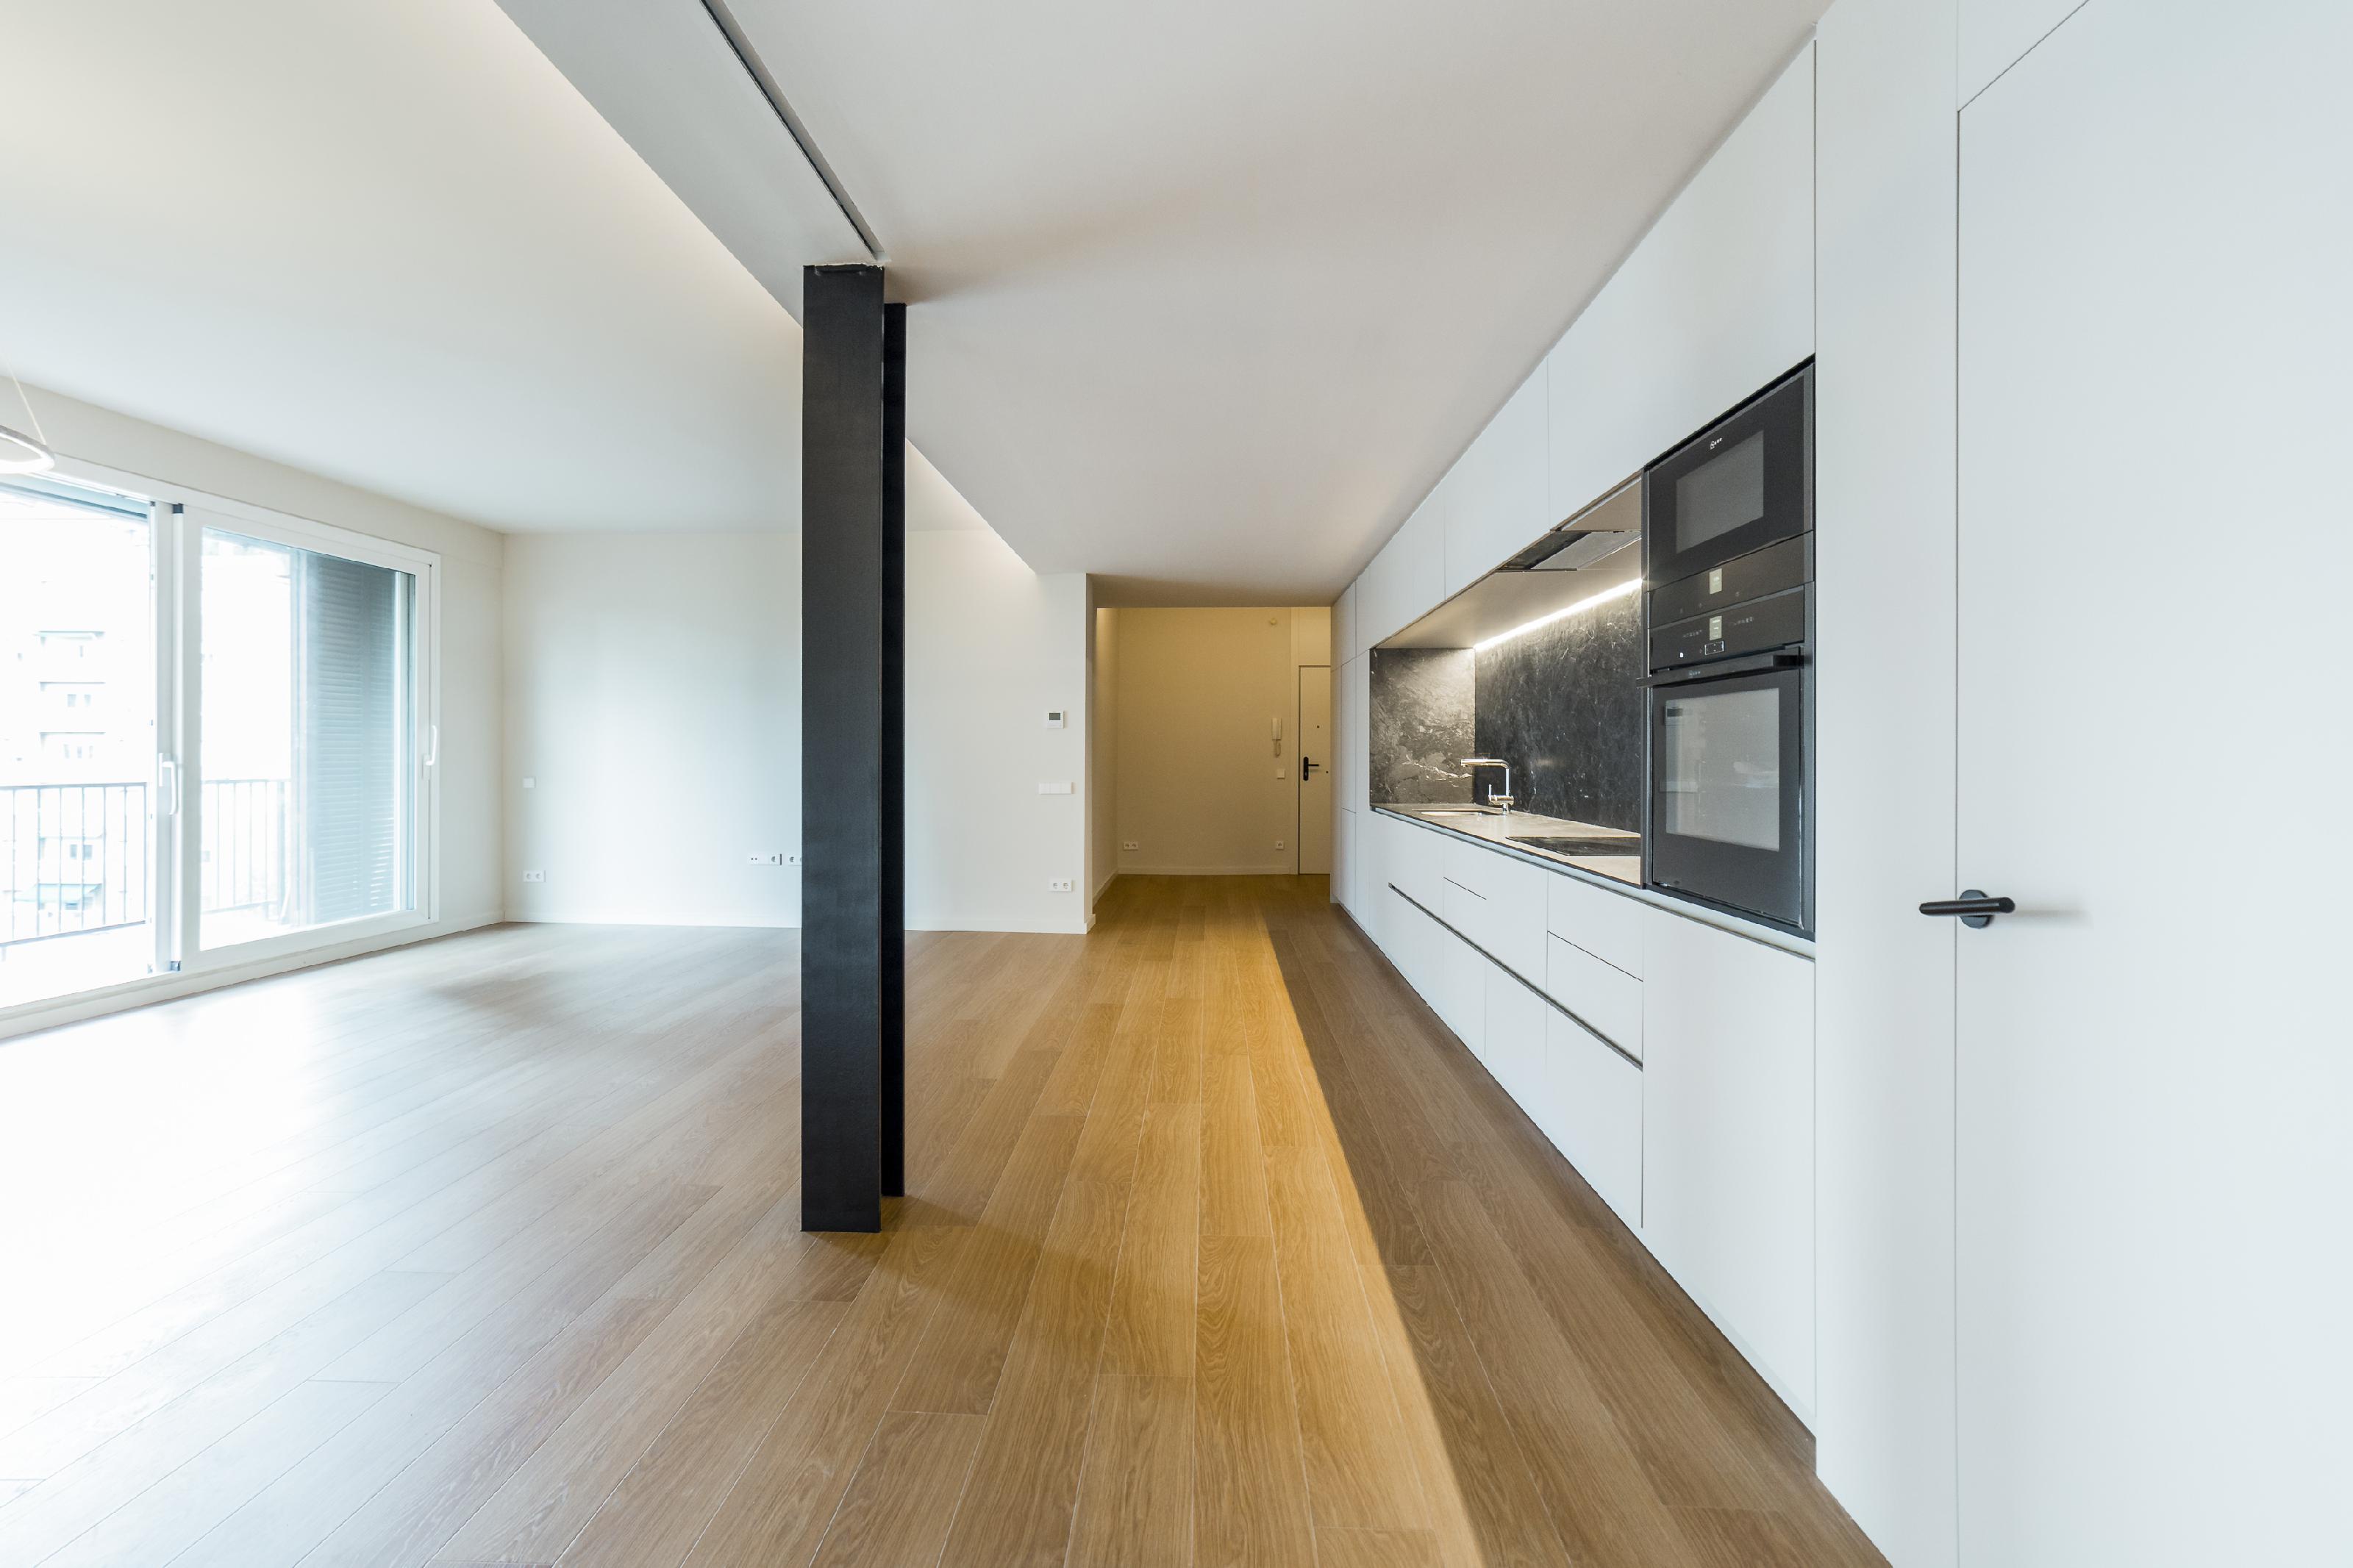 253492 Flat for sale in Sarrià-Sant Gervasi, Sant Gervasi-Galvany 17